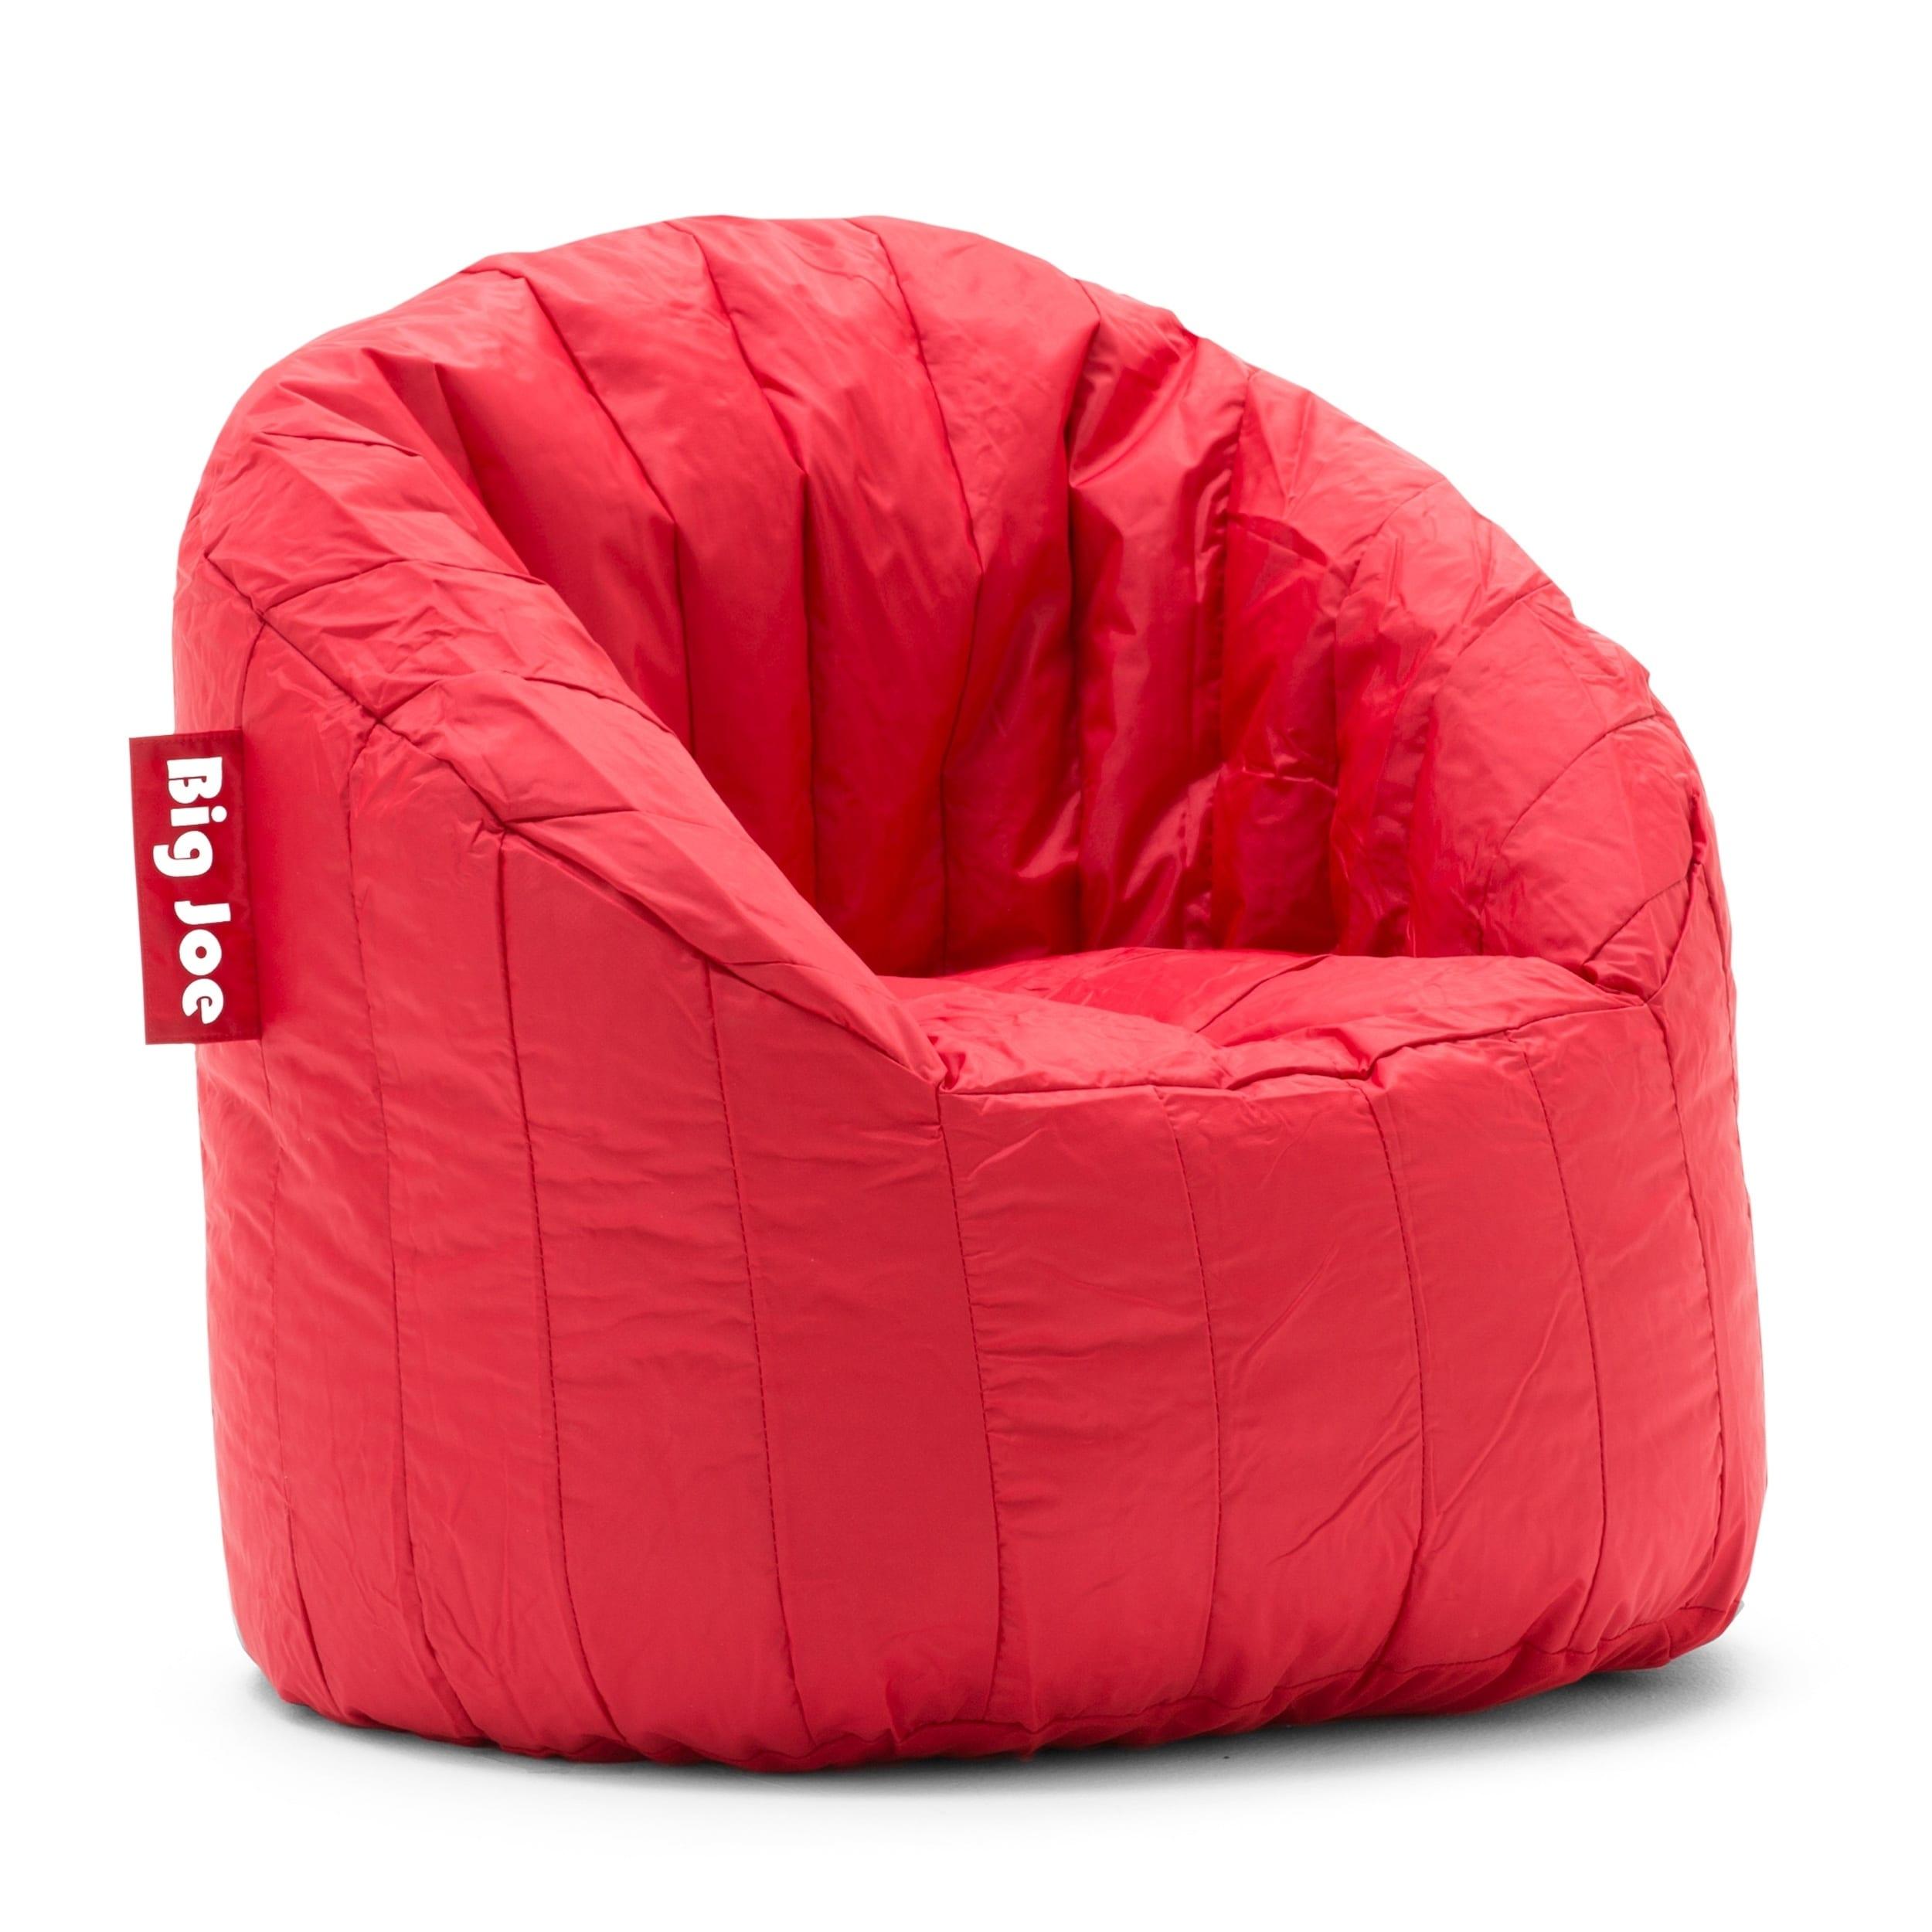 Shop Big Joe Lumin Bean Bag Chair, Multiple Colors   Free Shipping Today    Overstock.com   20750115